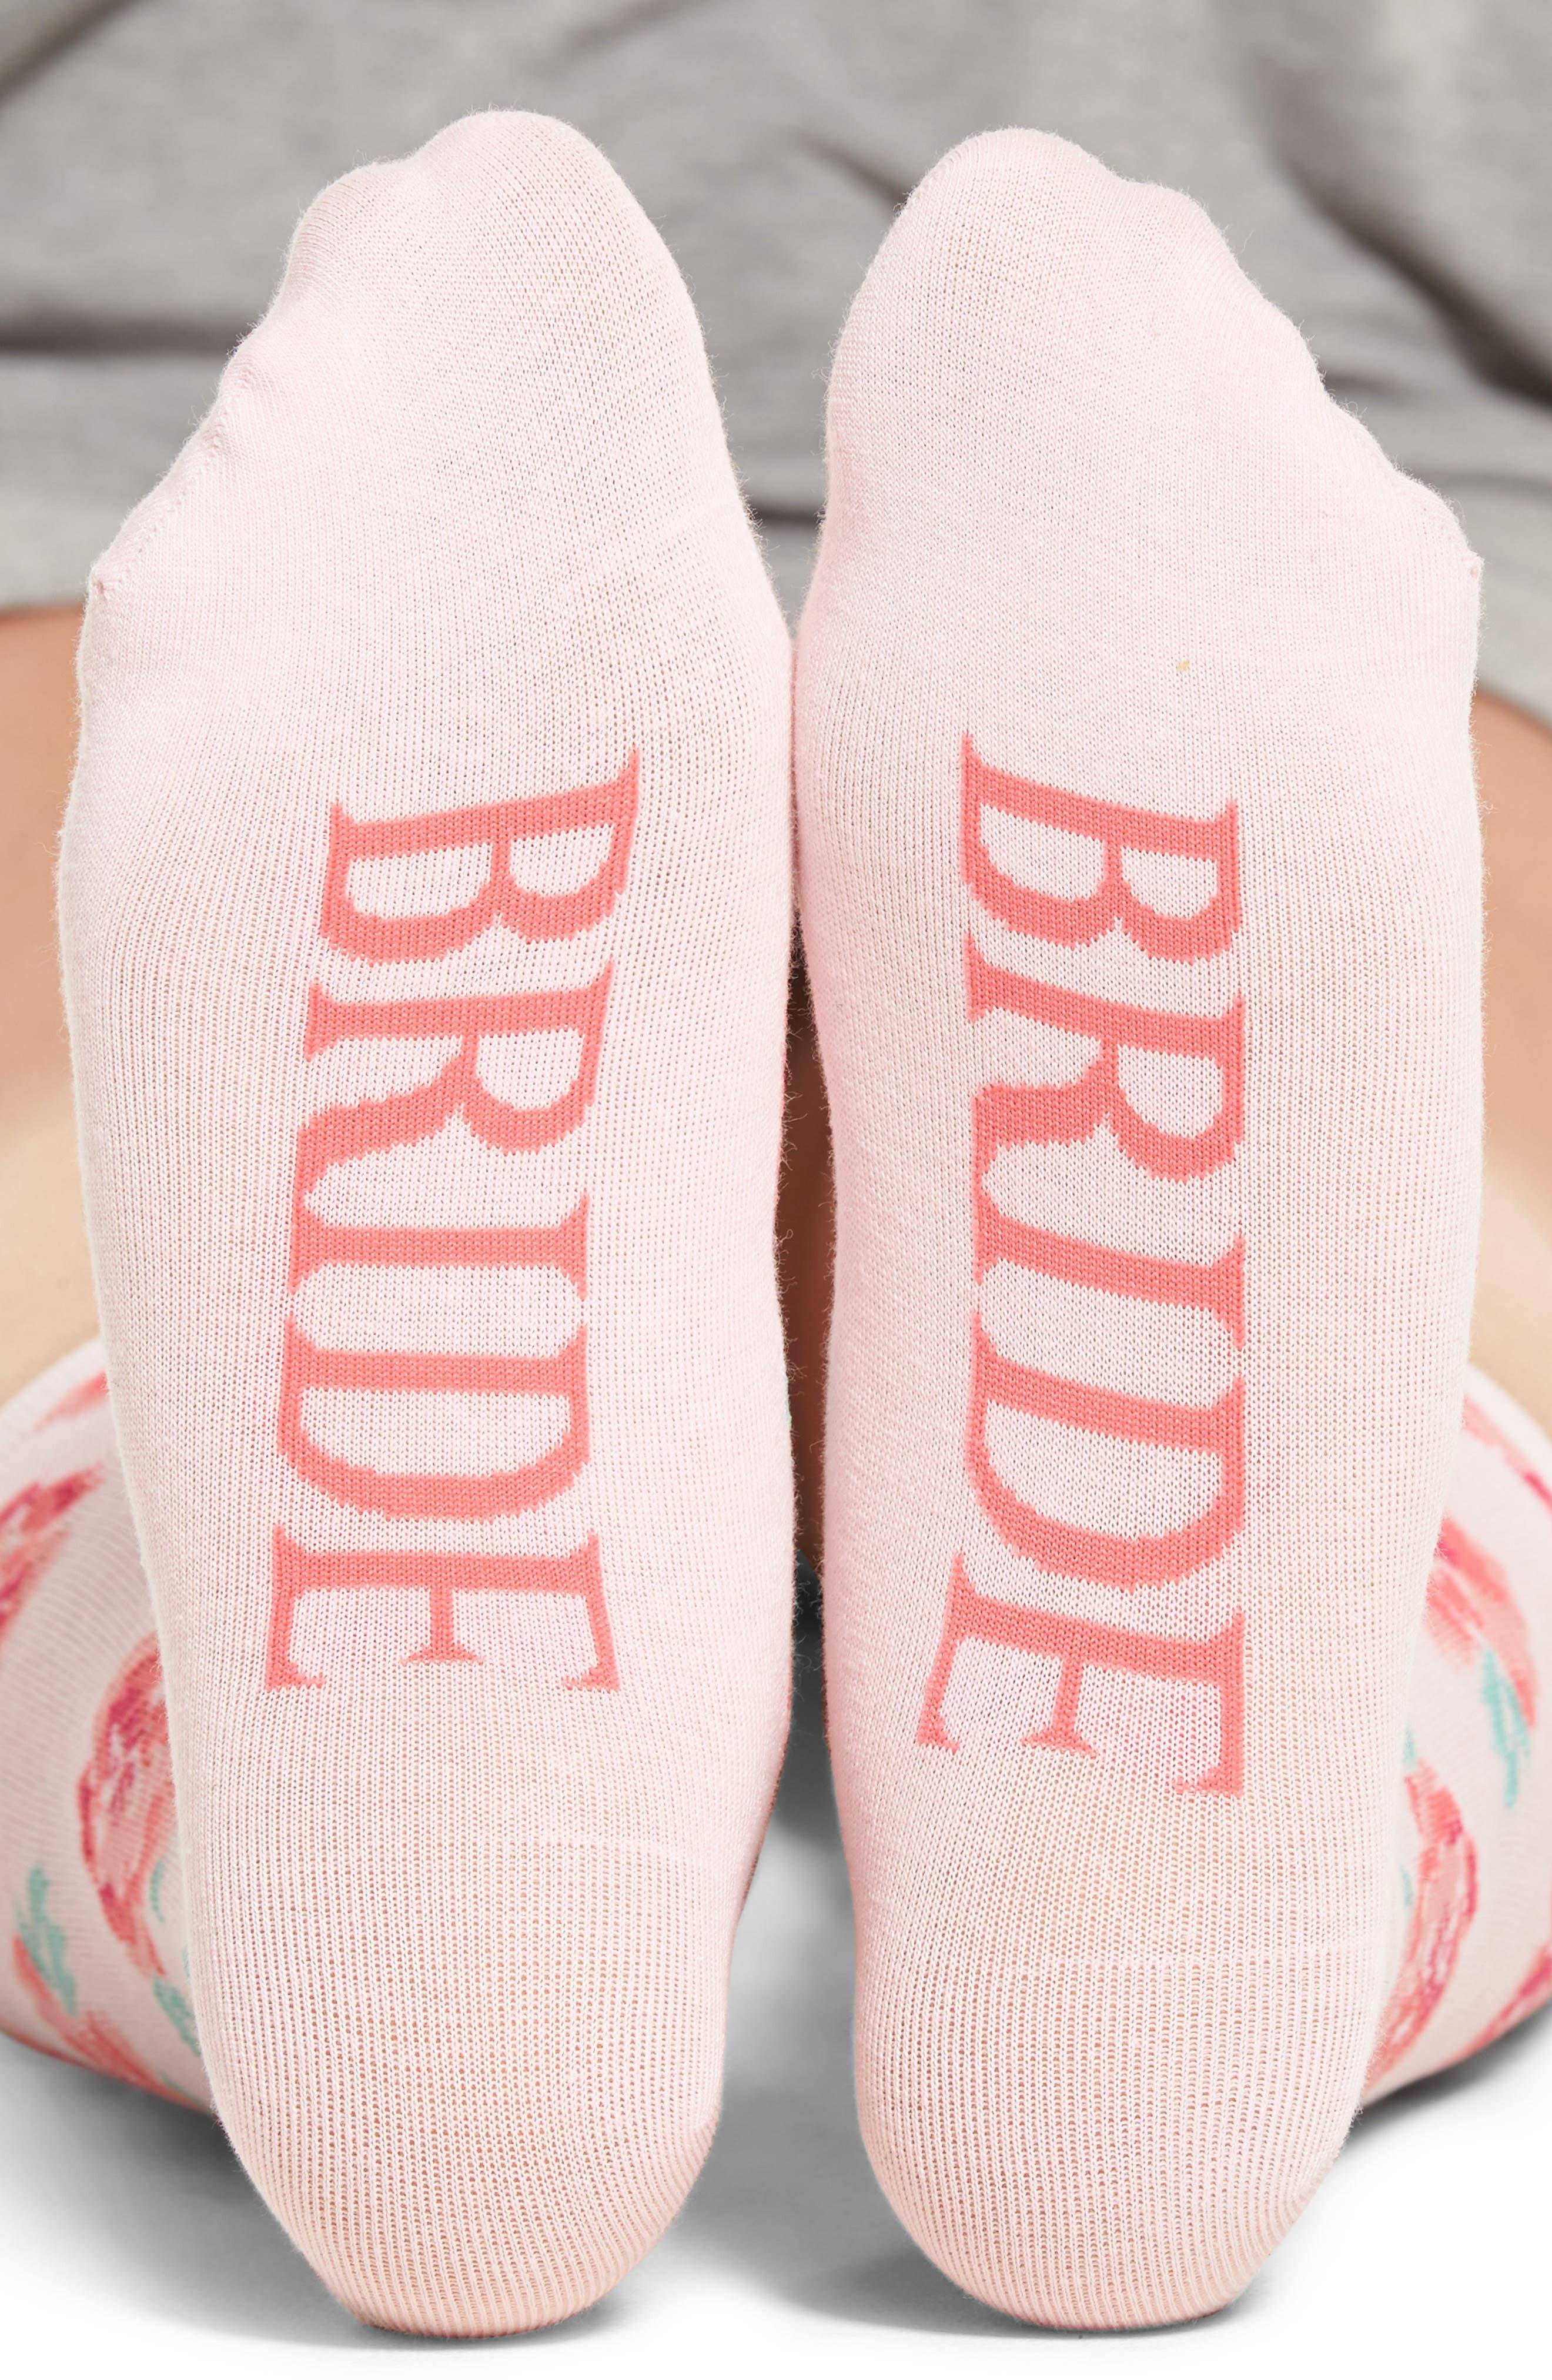 SOCKART BRIDE CREW SOCKS